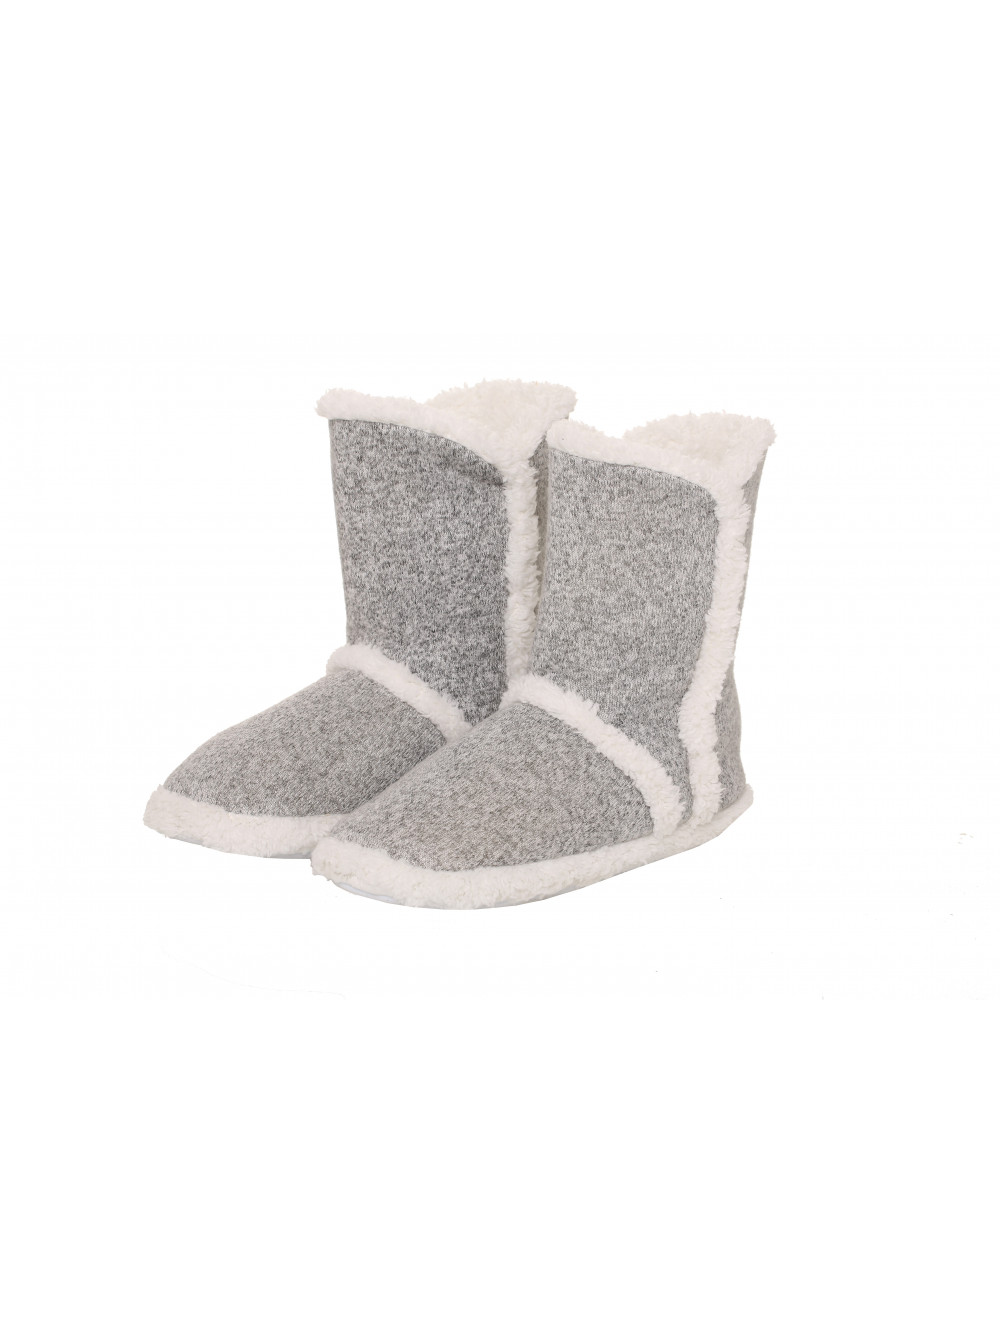 SWEATCHOU boots